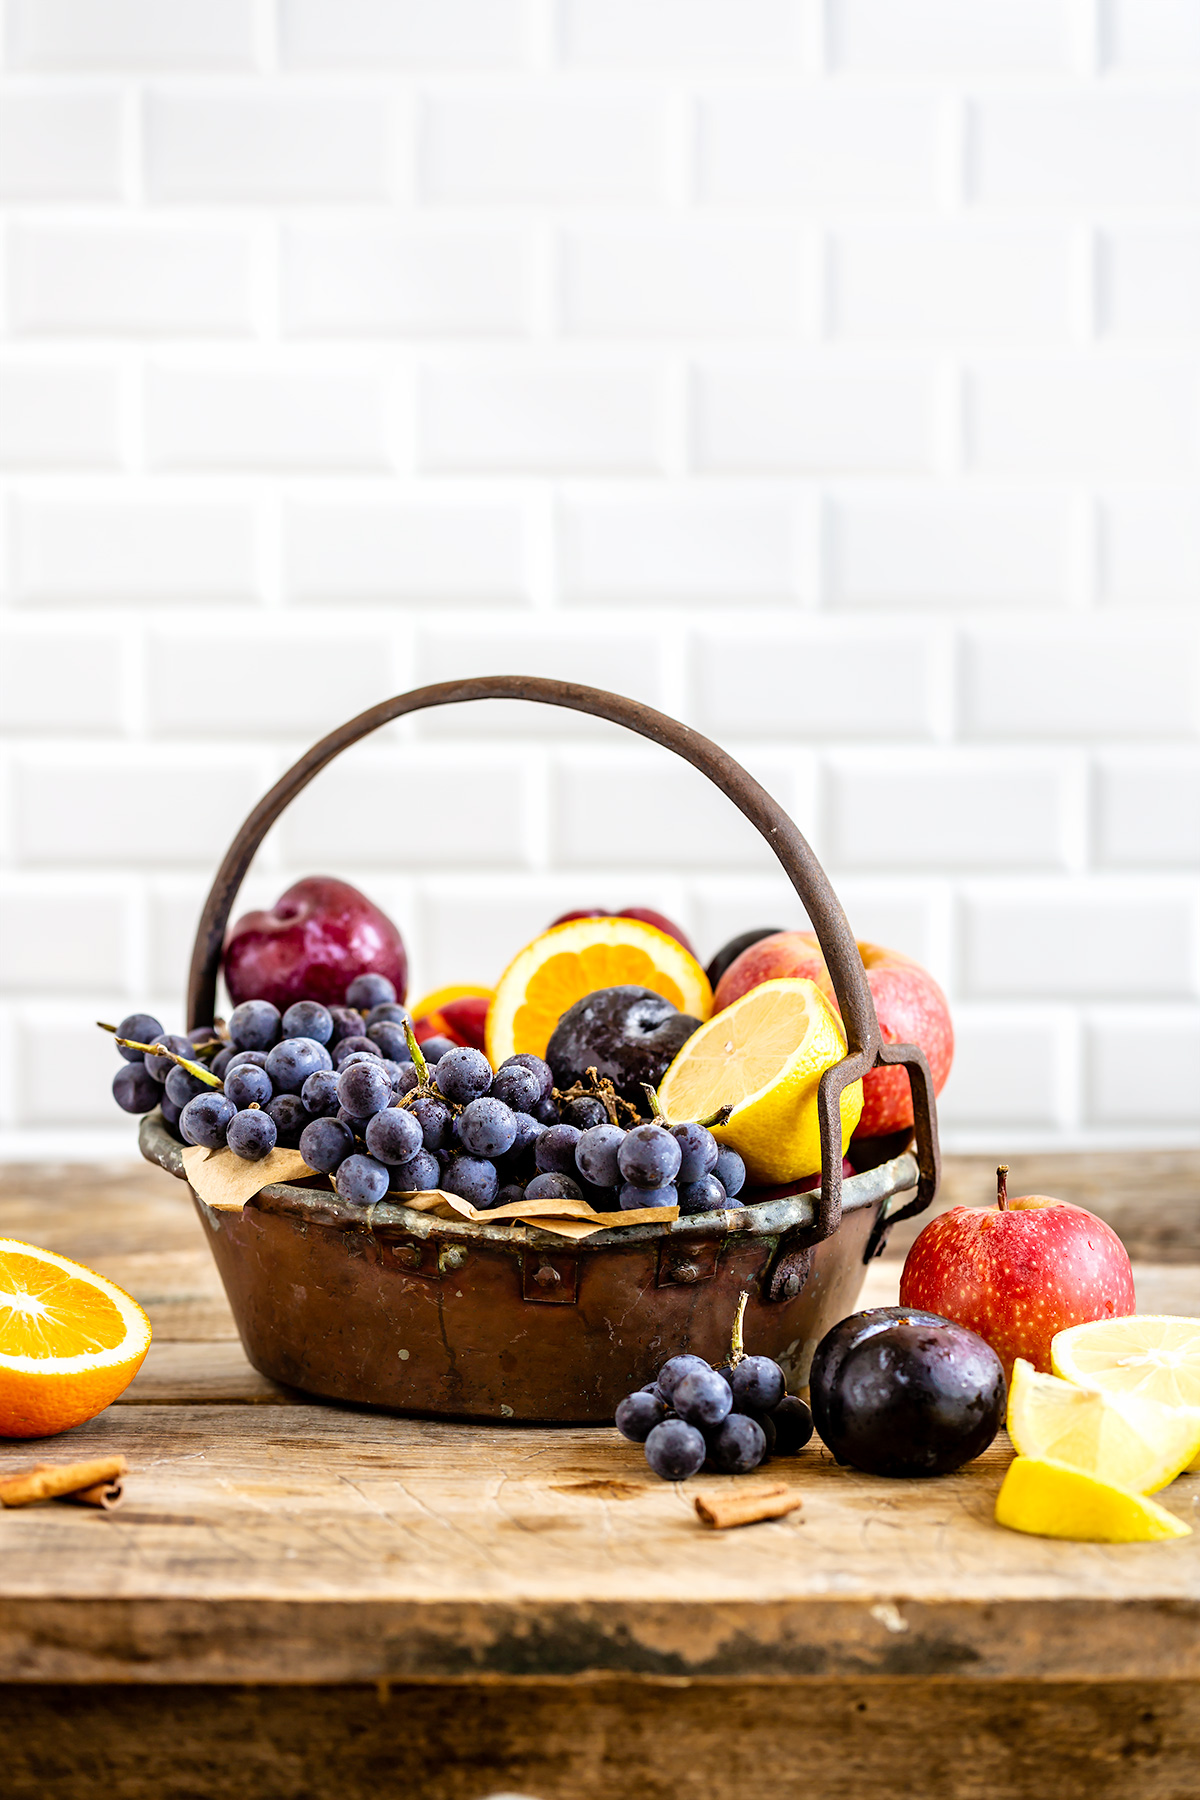 ricetta SANGRIA analcolica al KOMBUCHA facile sana healthy simple non alcoholic kombucha SANGRIA vegan recipe